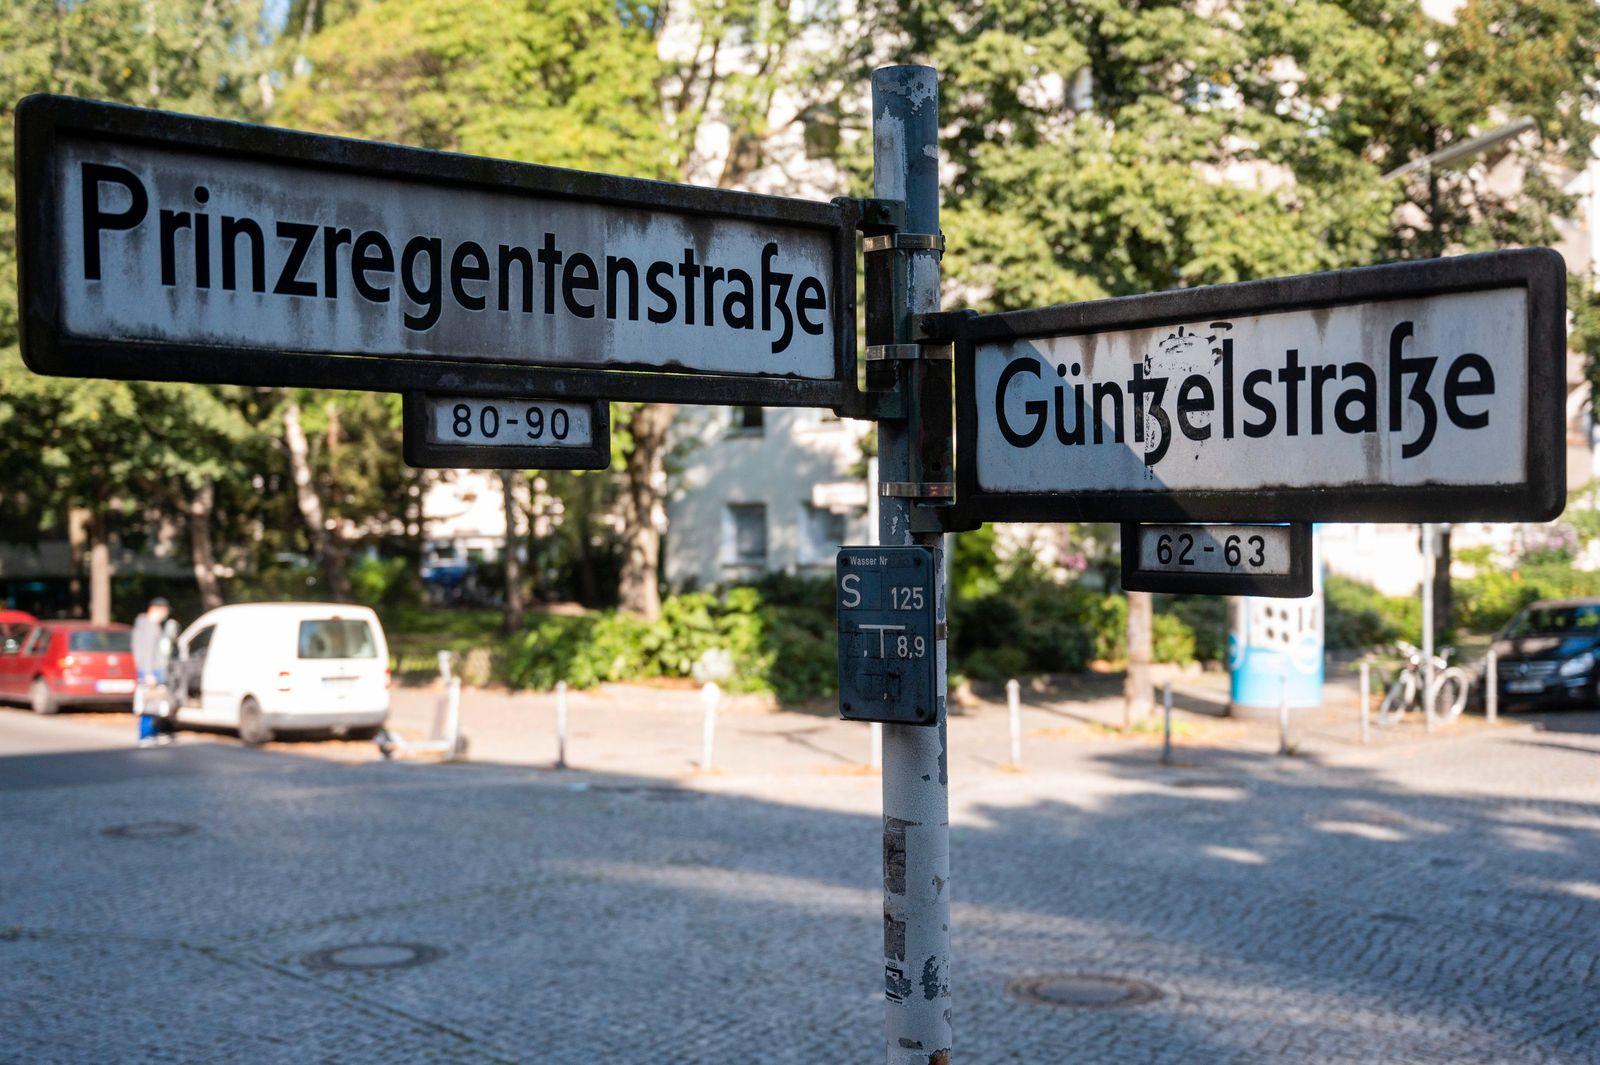 Messerattacke in Berlin Wilmersdorf